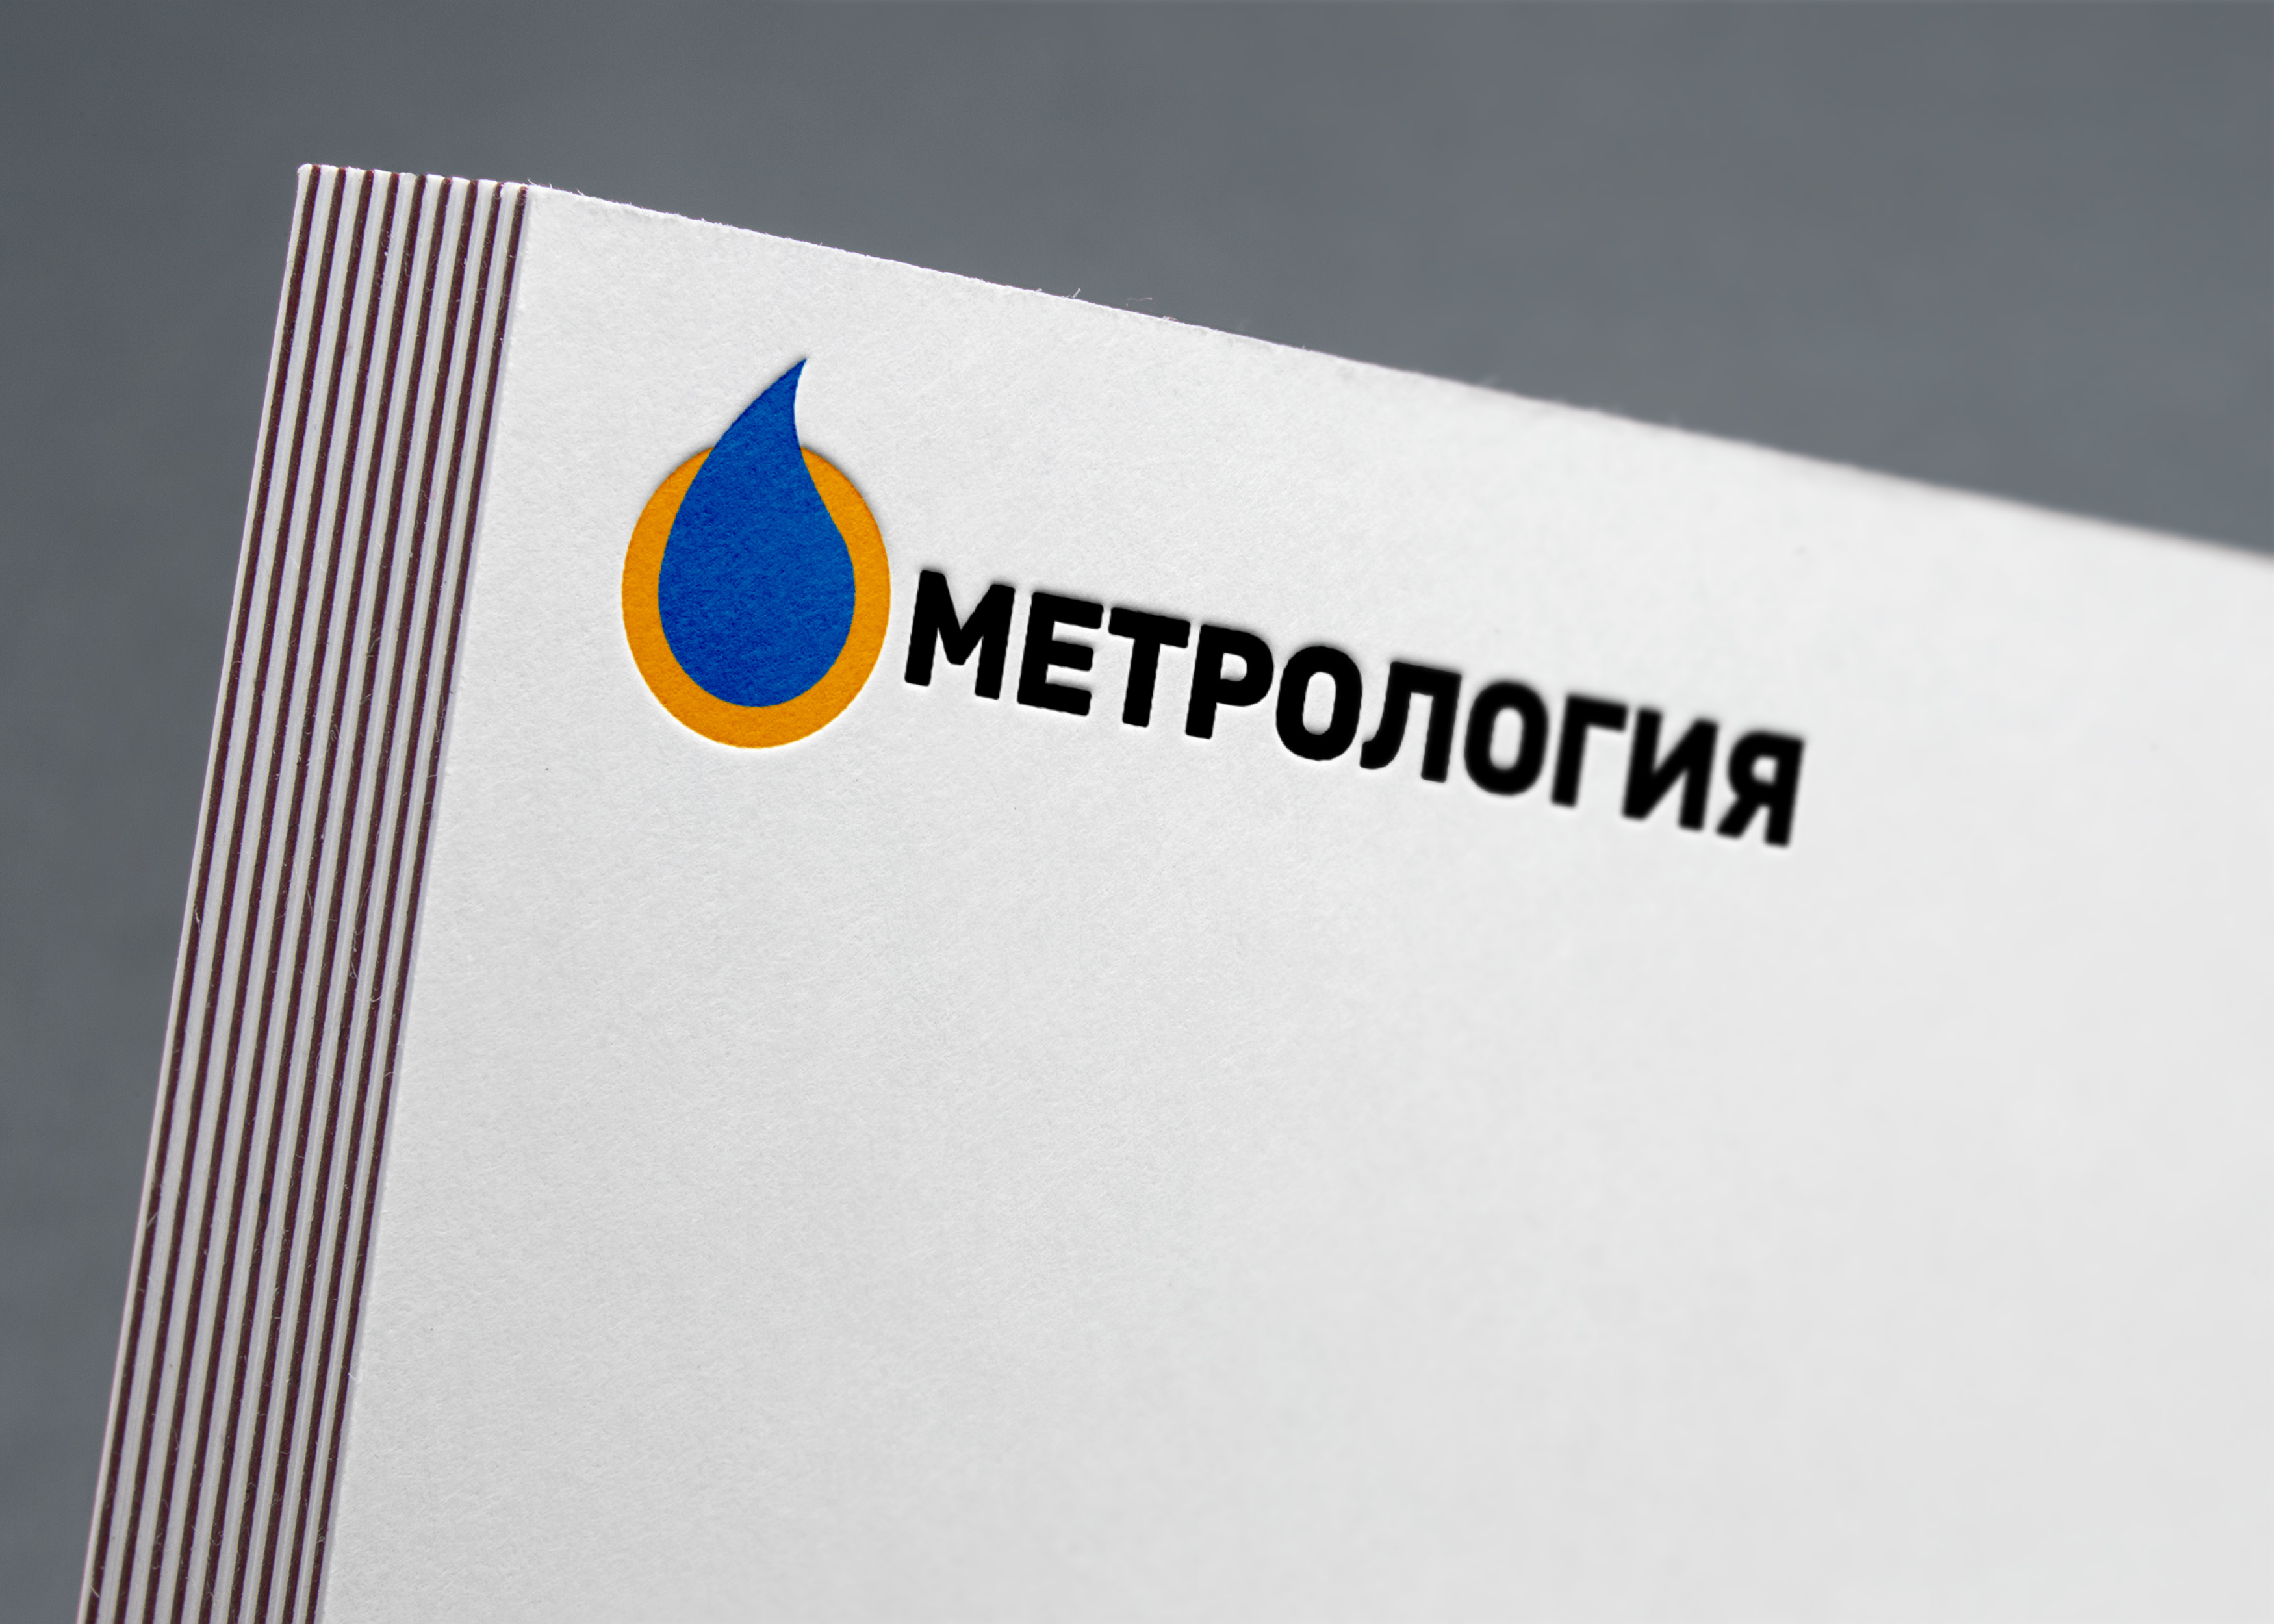 Разработать логотип, визитку, фирменный бланк. фото f_42558f4e2b0b2909.jpg